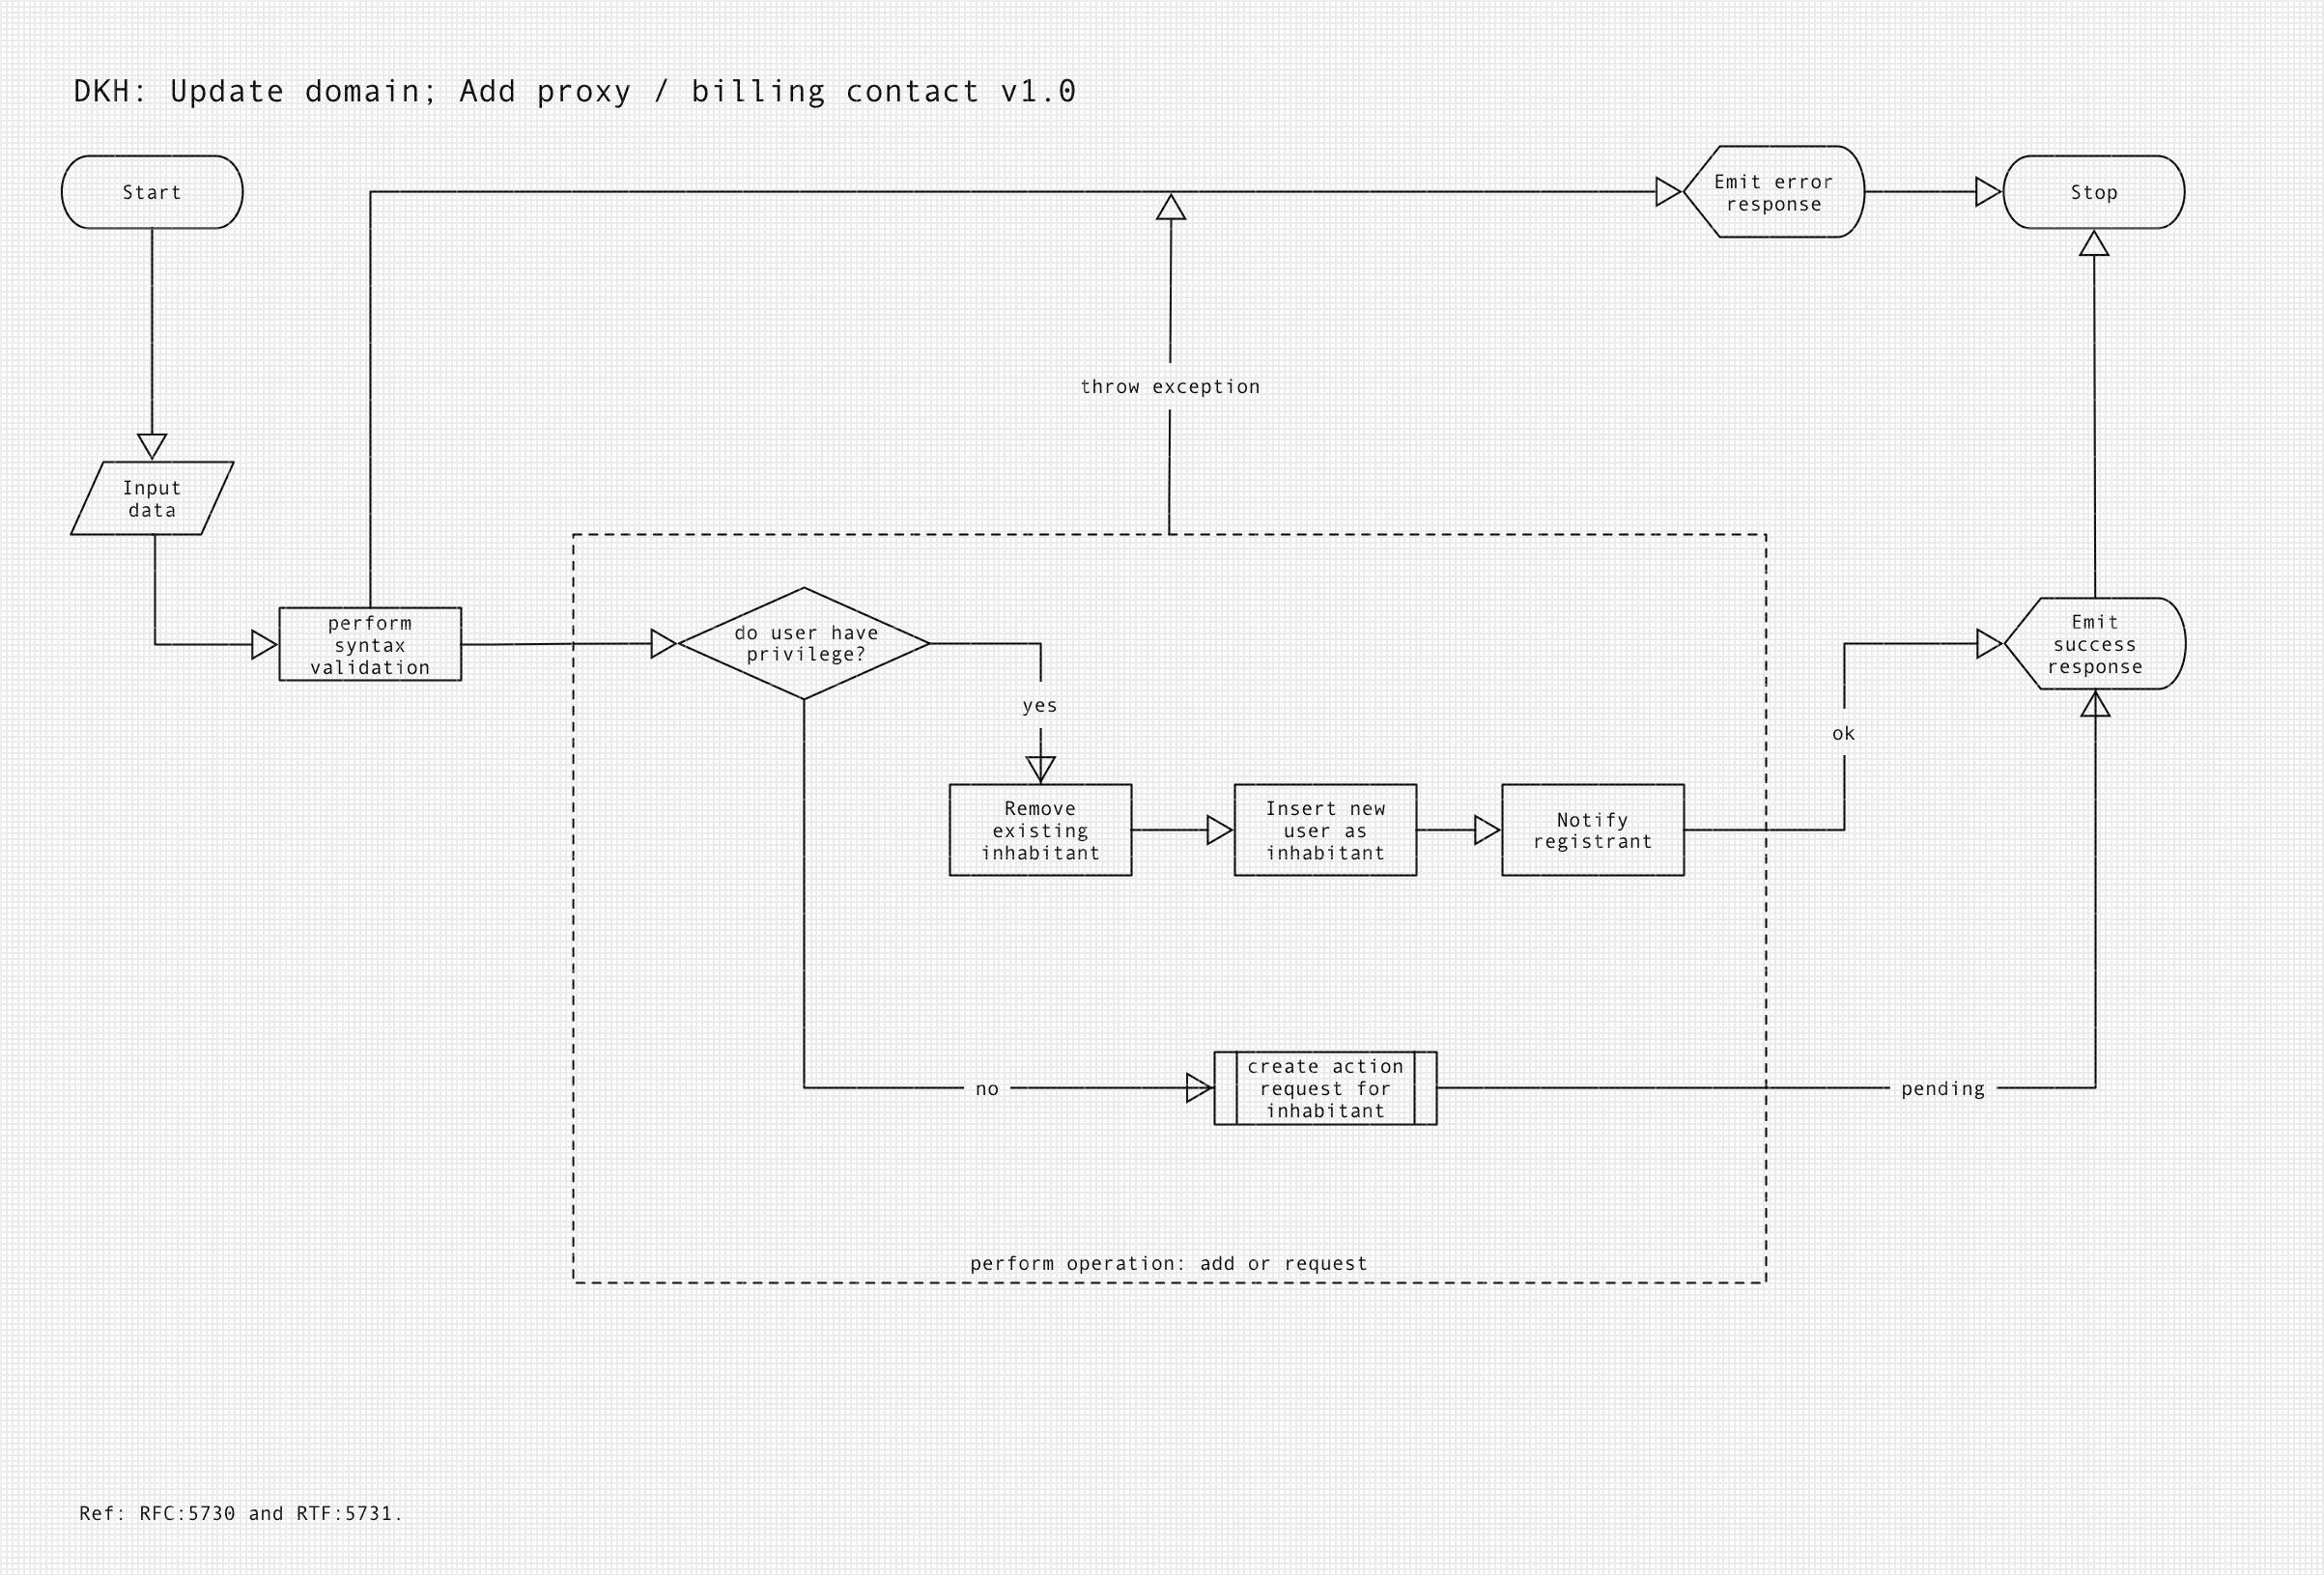 Update domain - Add billing/admin contact sub-process